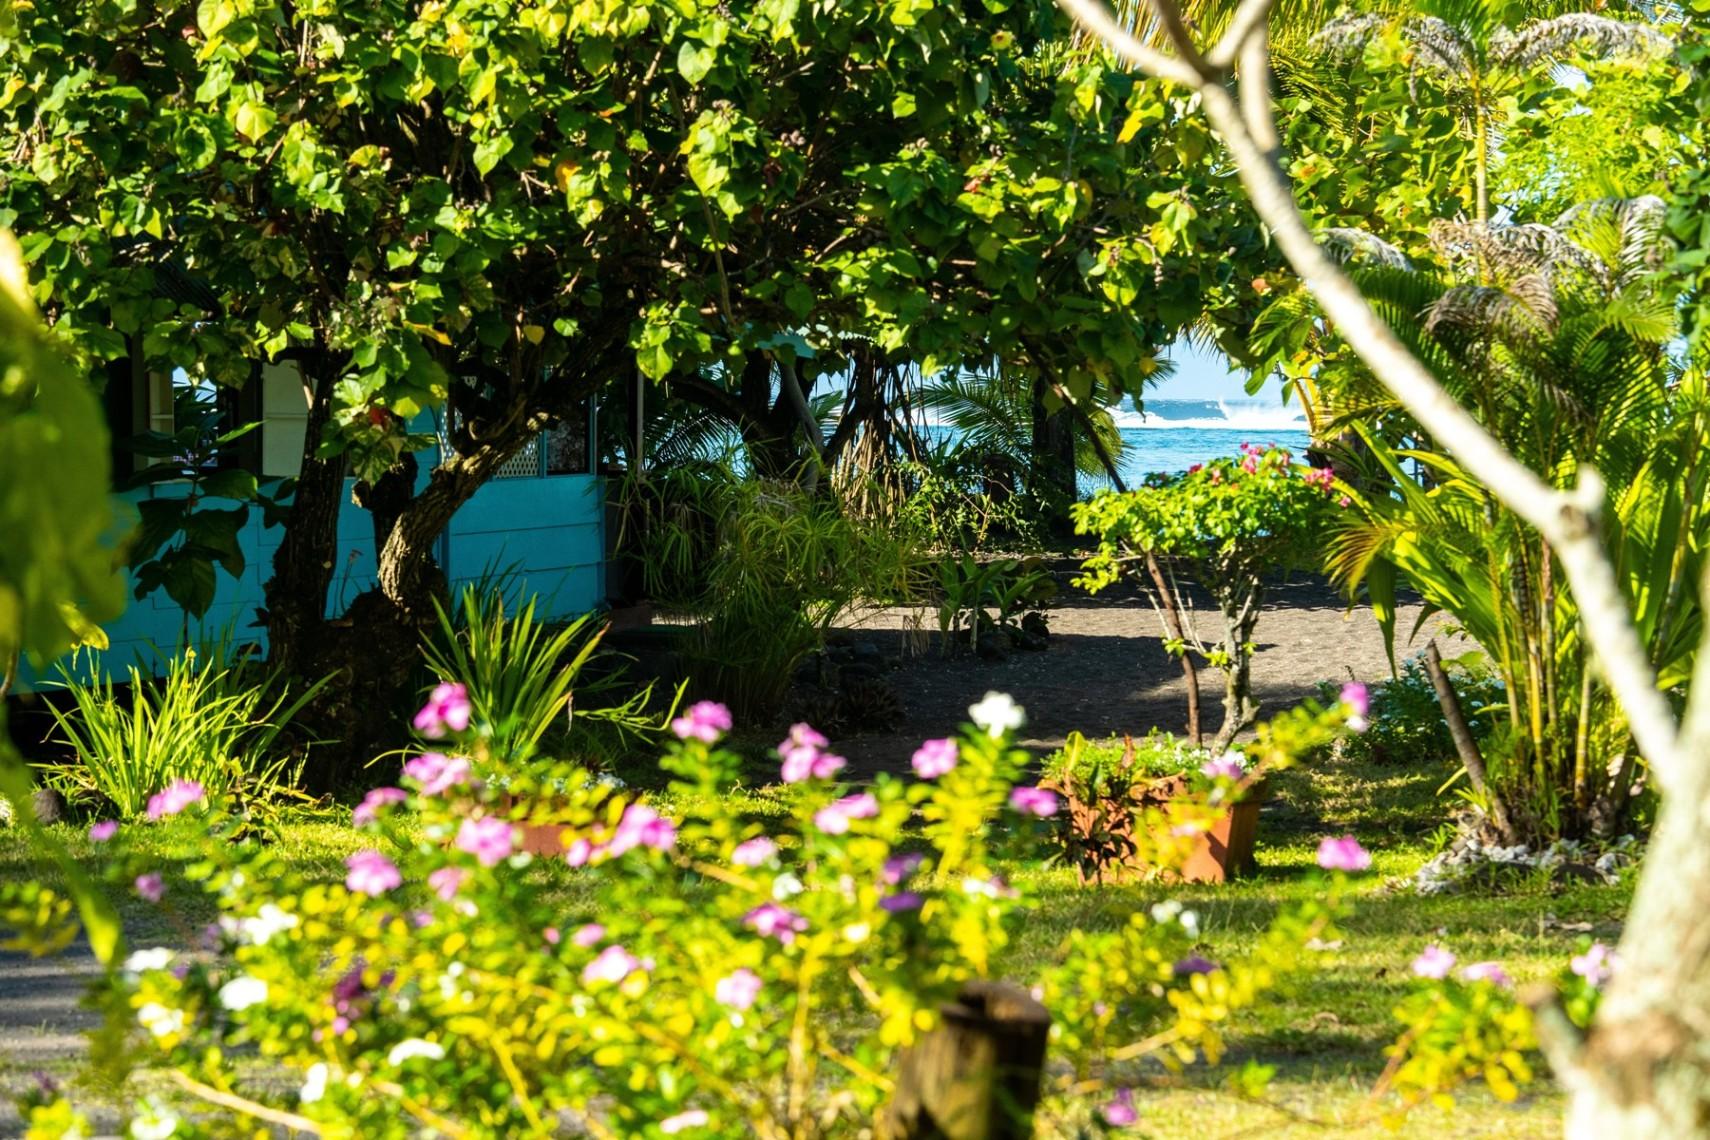 https://tahititourisme.mx/wp-content/uploads/2019/08/copie-tahiti-tourisme-800ko-1.jpg